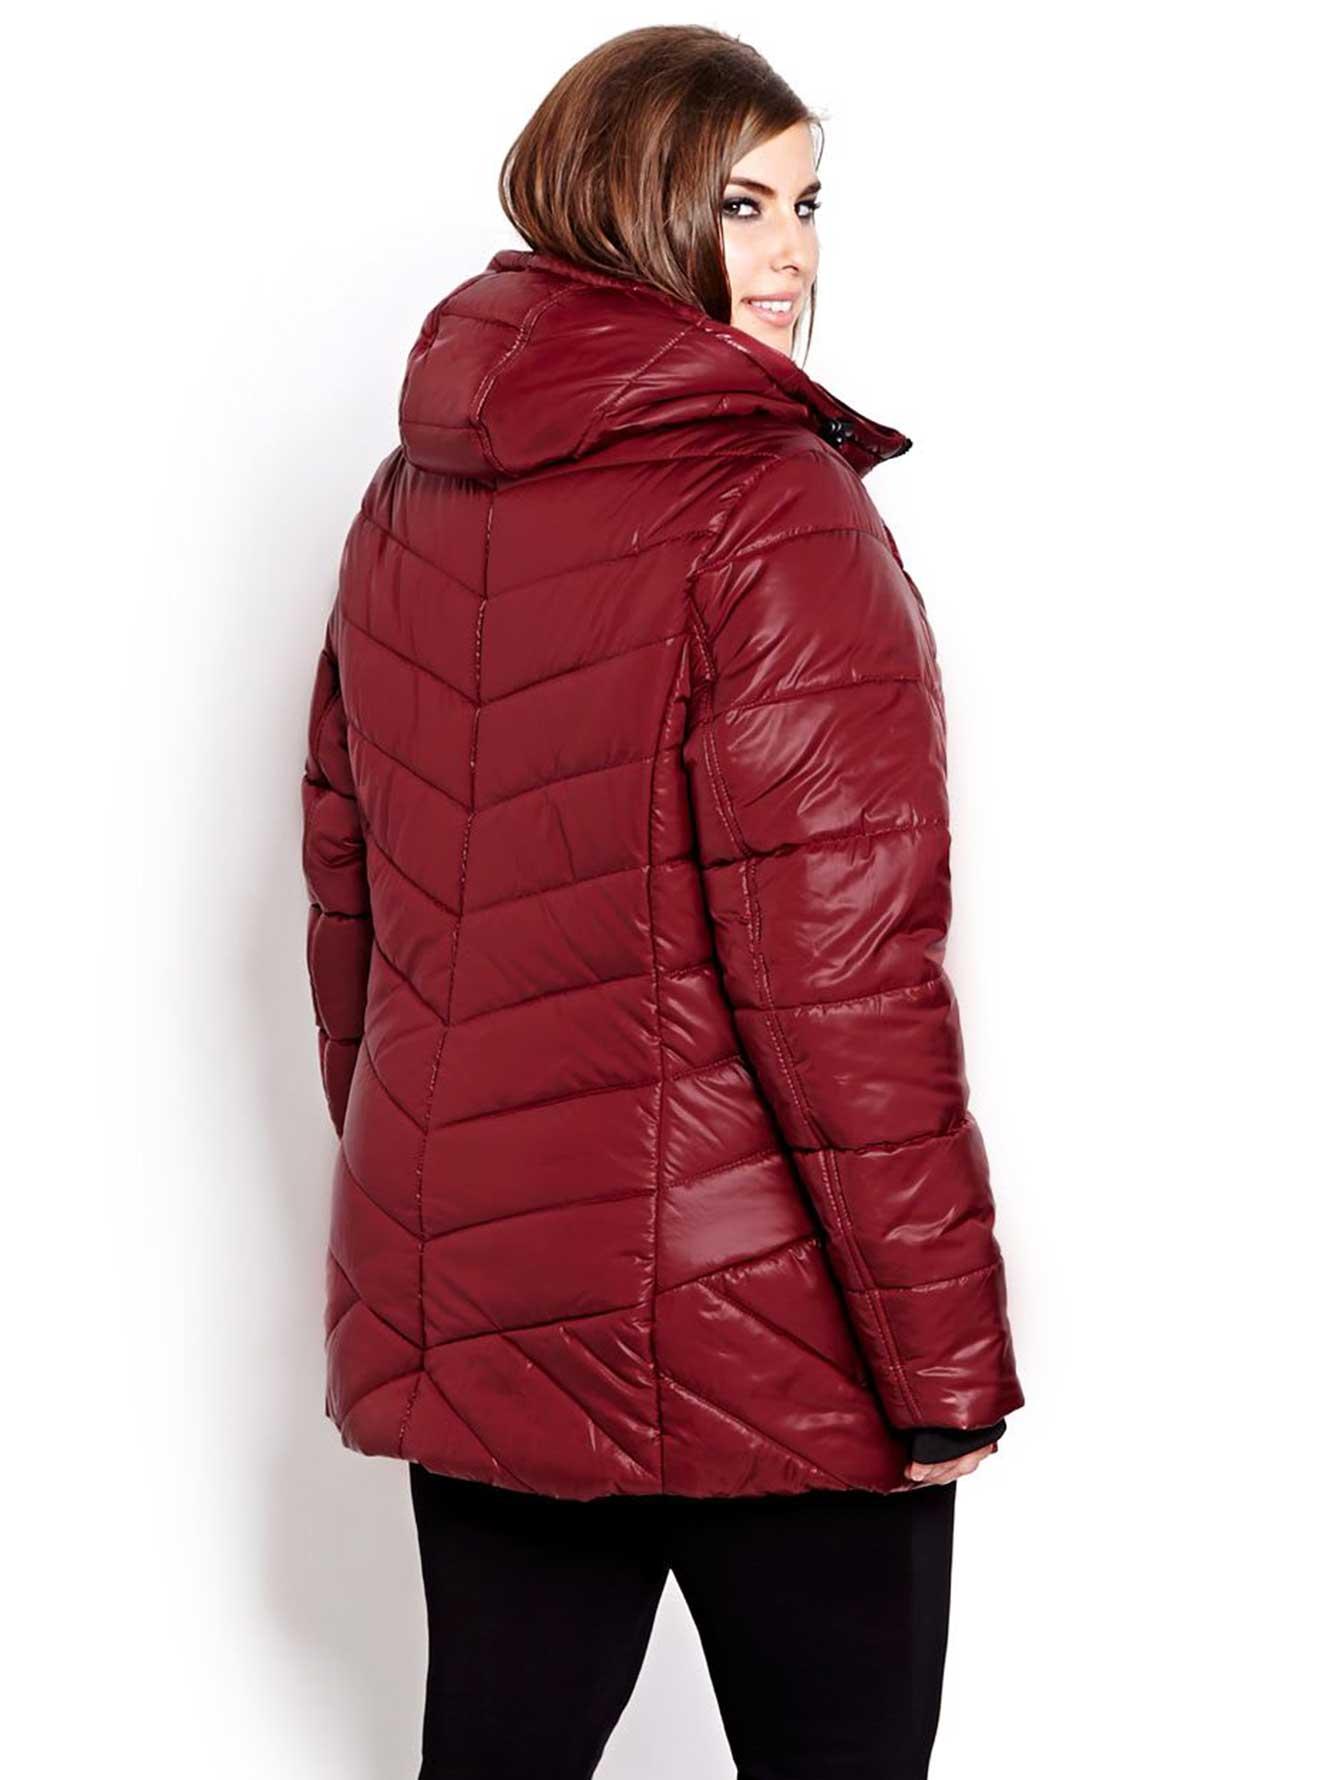 21abdc0a4db Noize Short Puffer Jacket